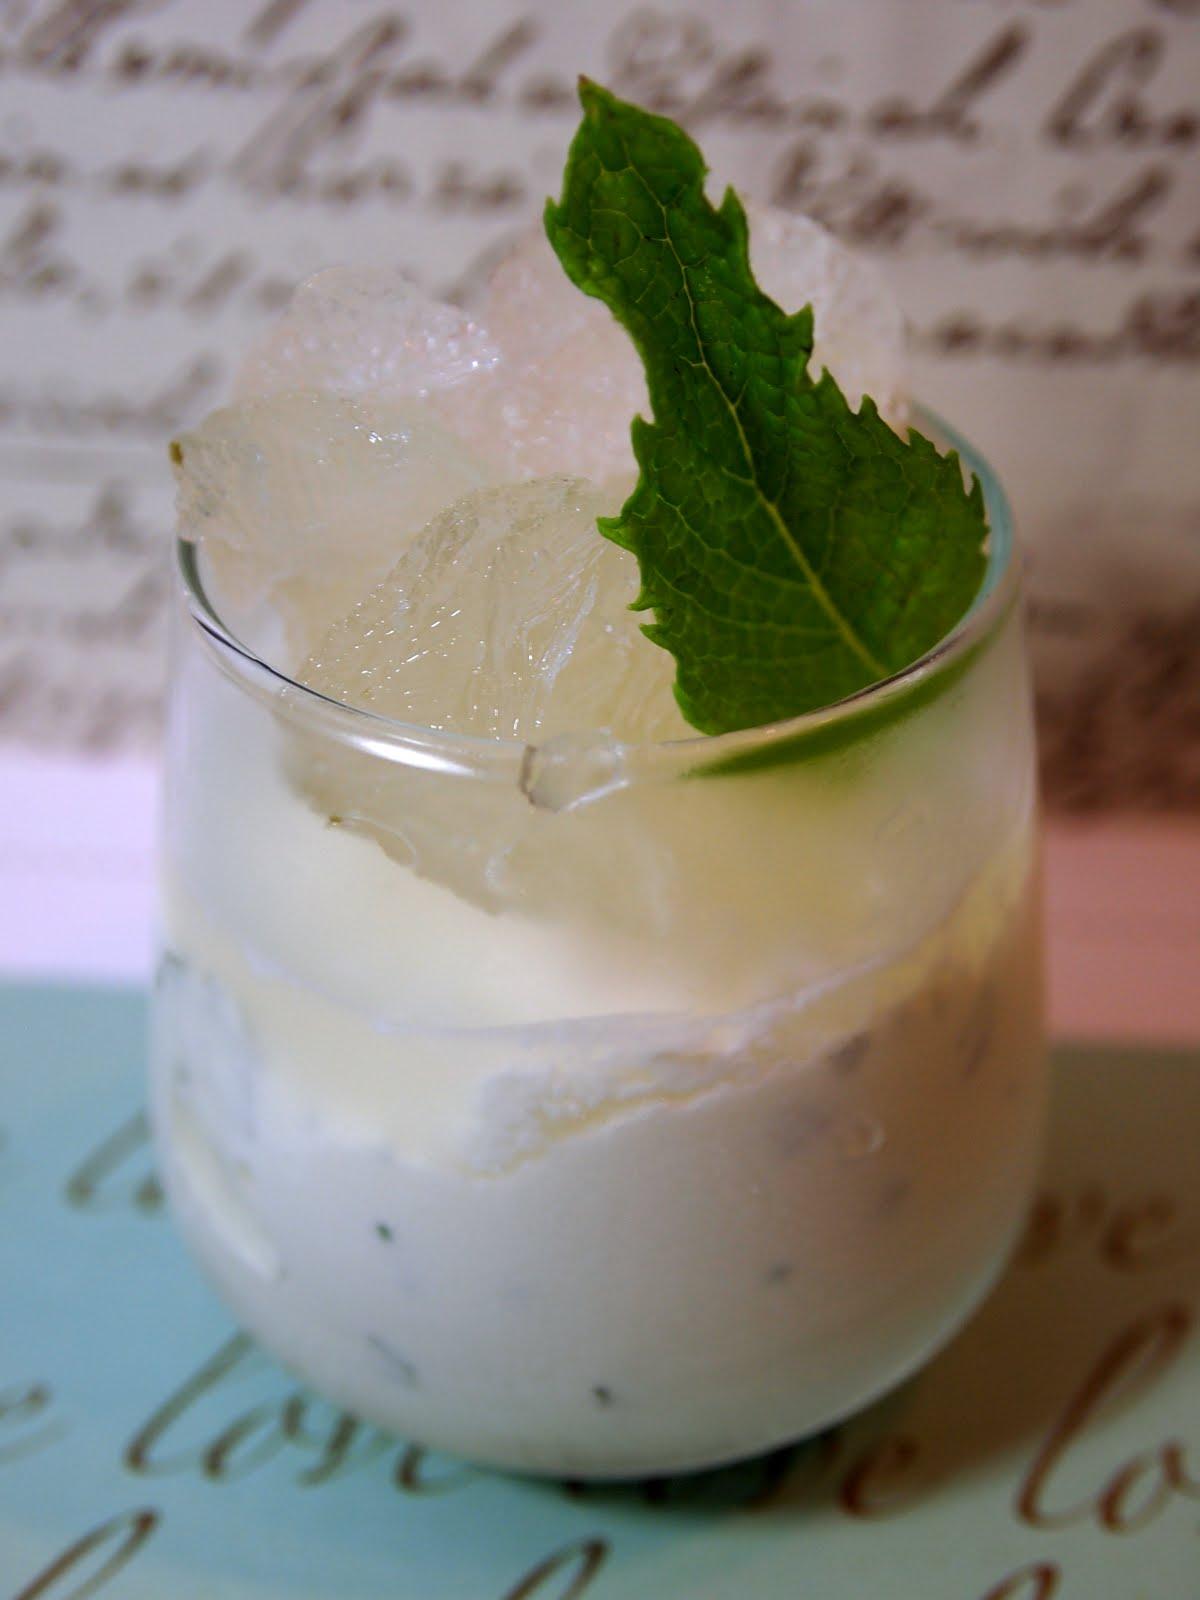 fla-vor-ice || lemon mint granita